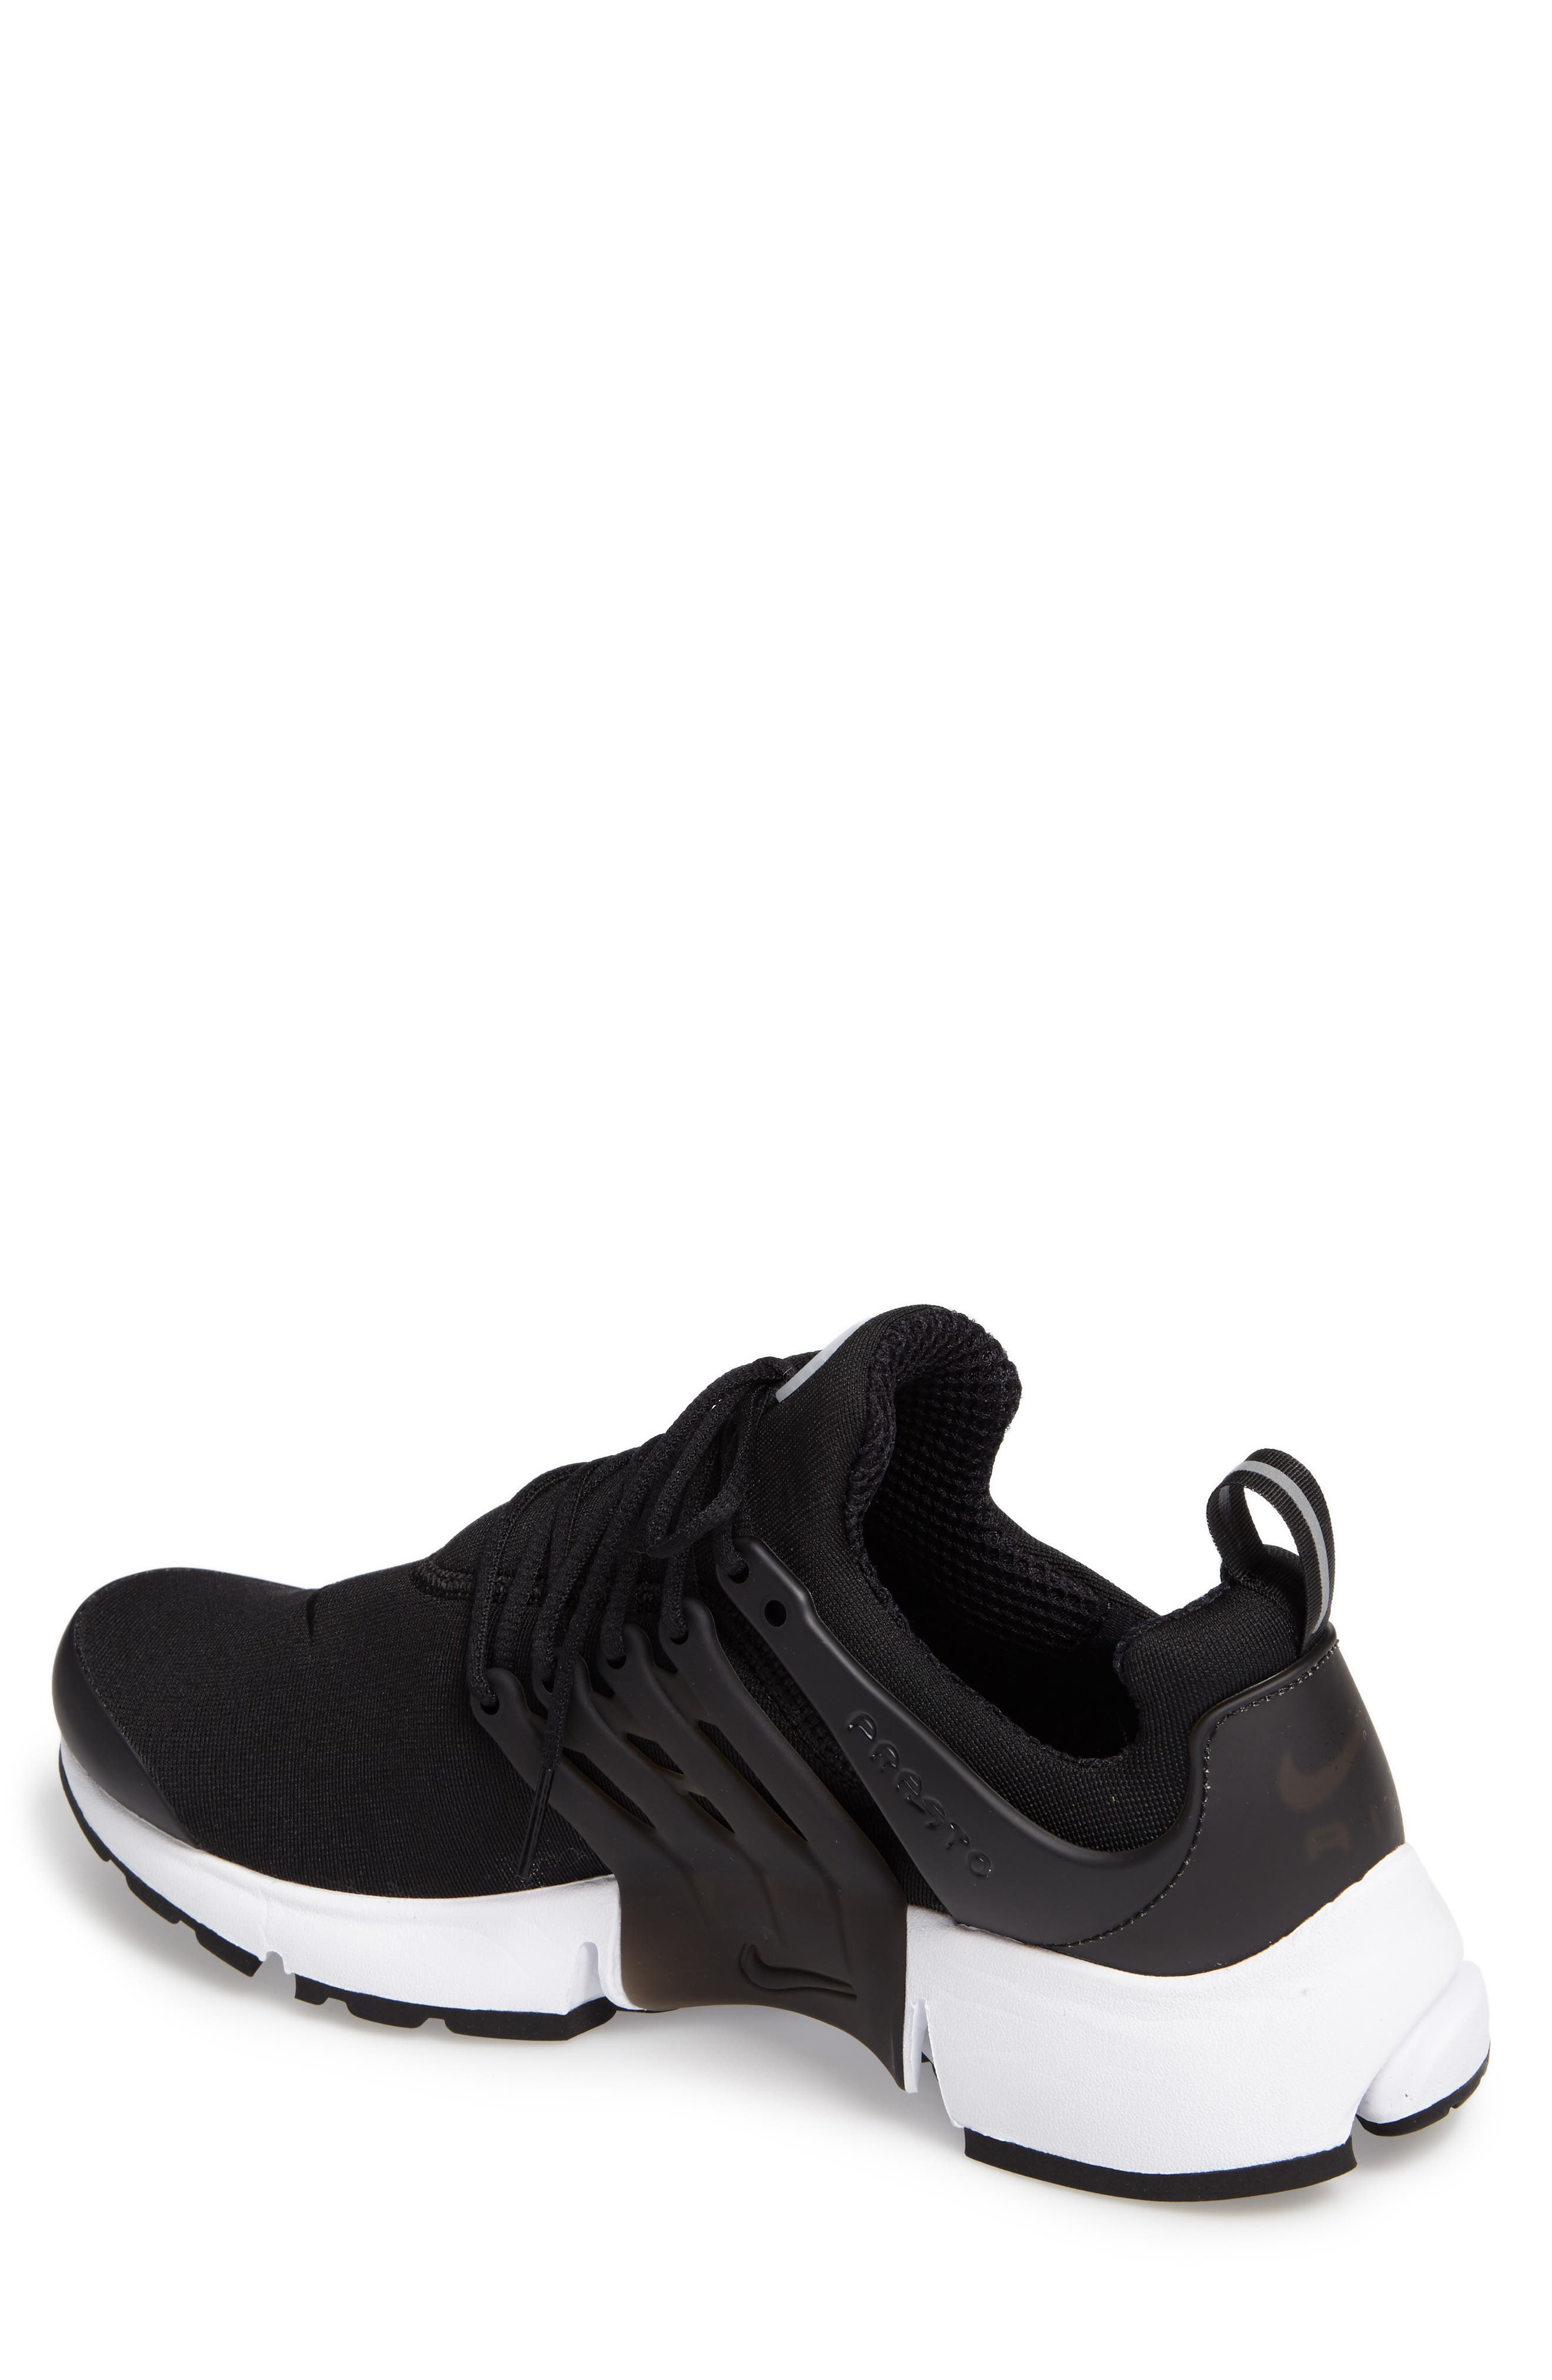 Air Presto Essential Sneaker,                             Alternate thumbnail 2, color,                             Black/ Black/ White